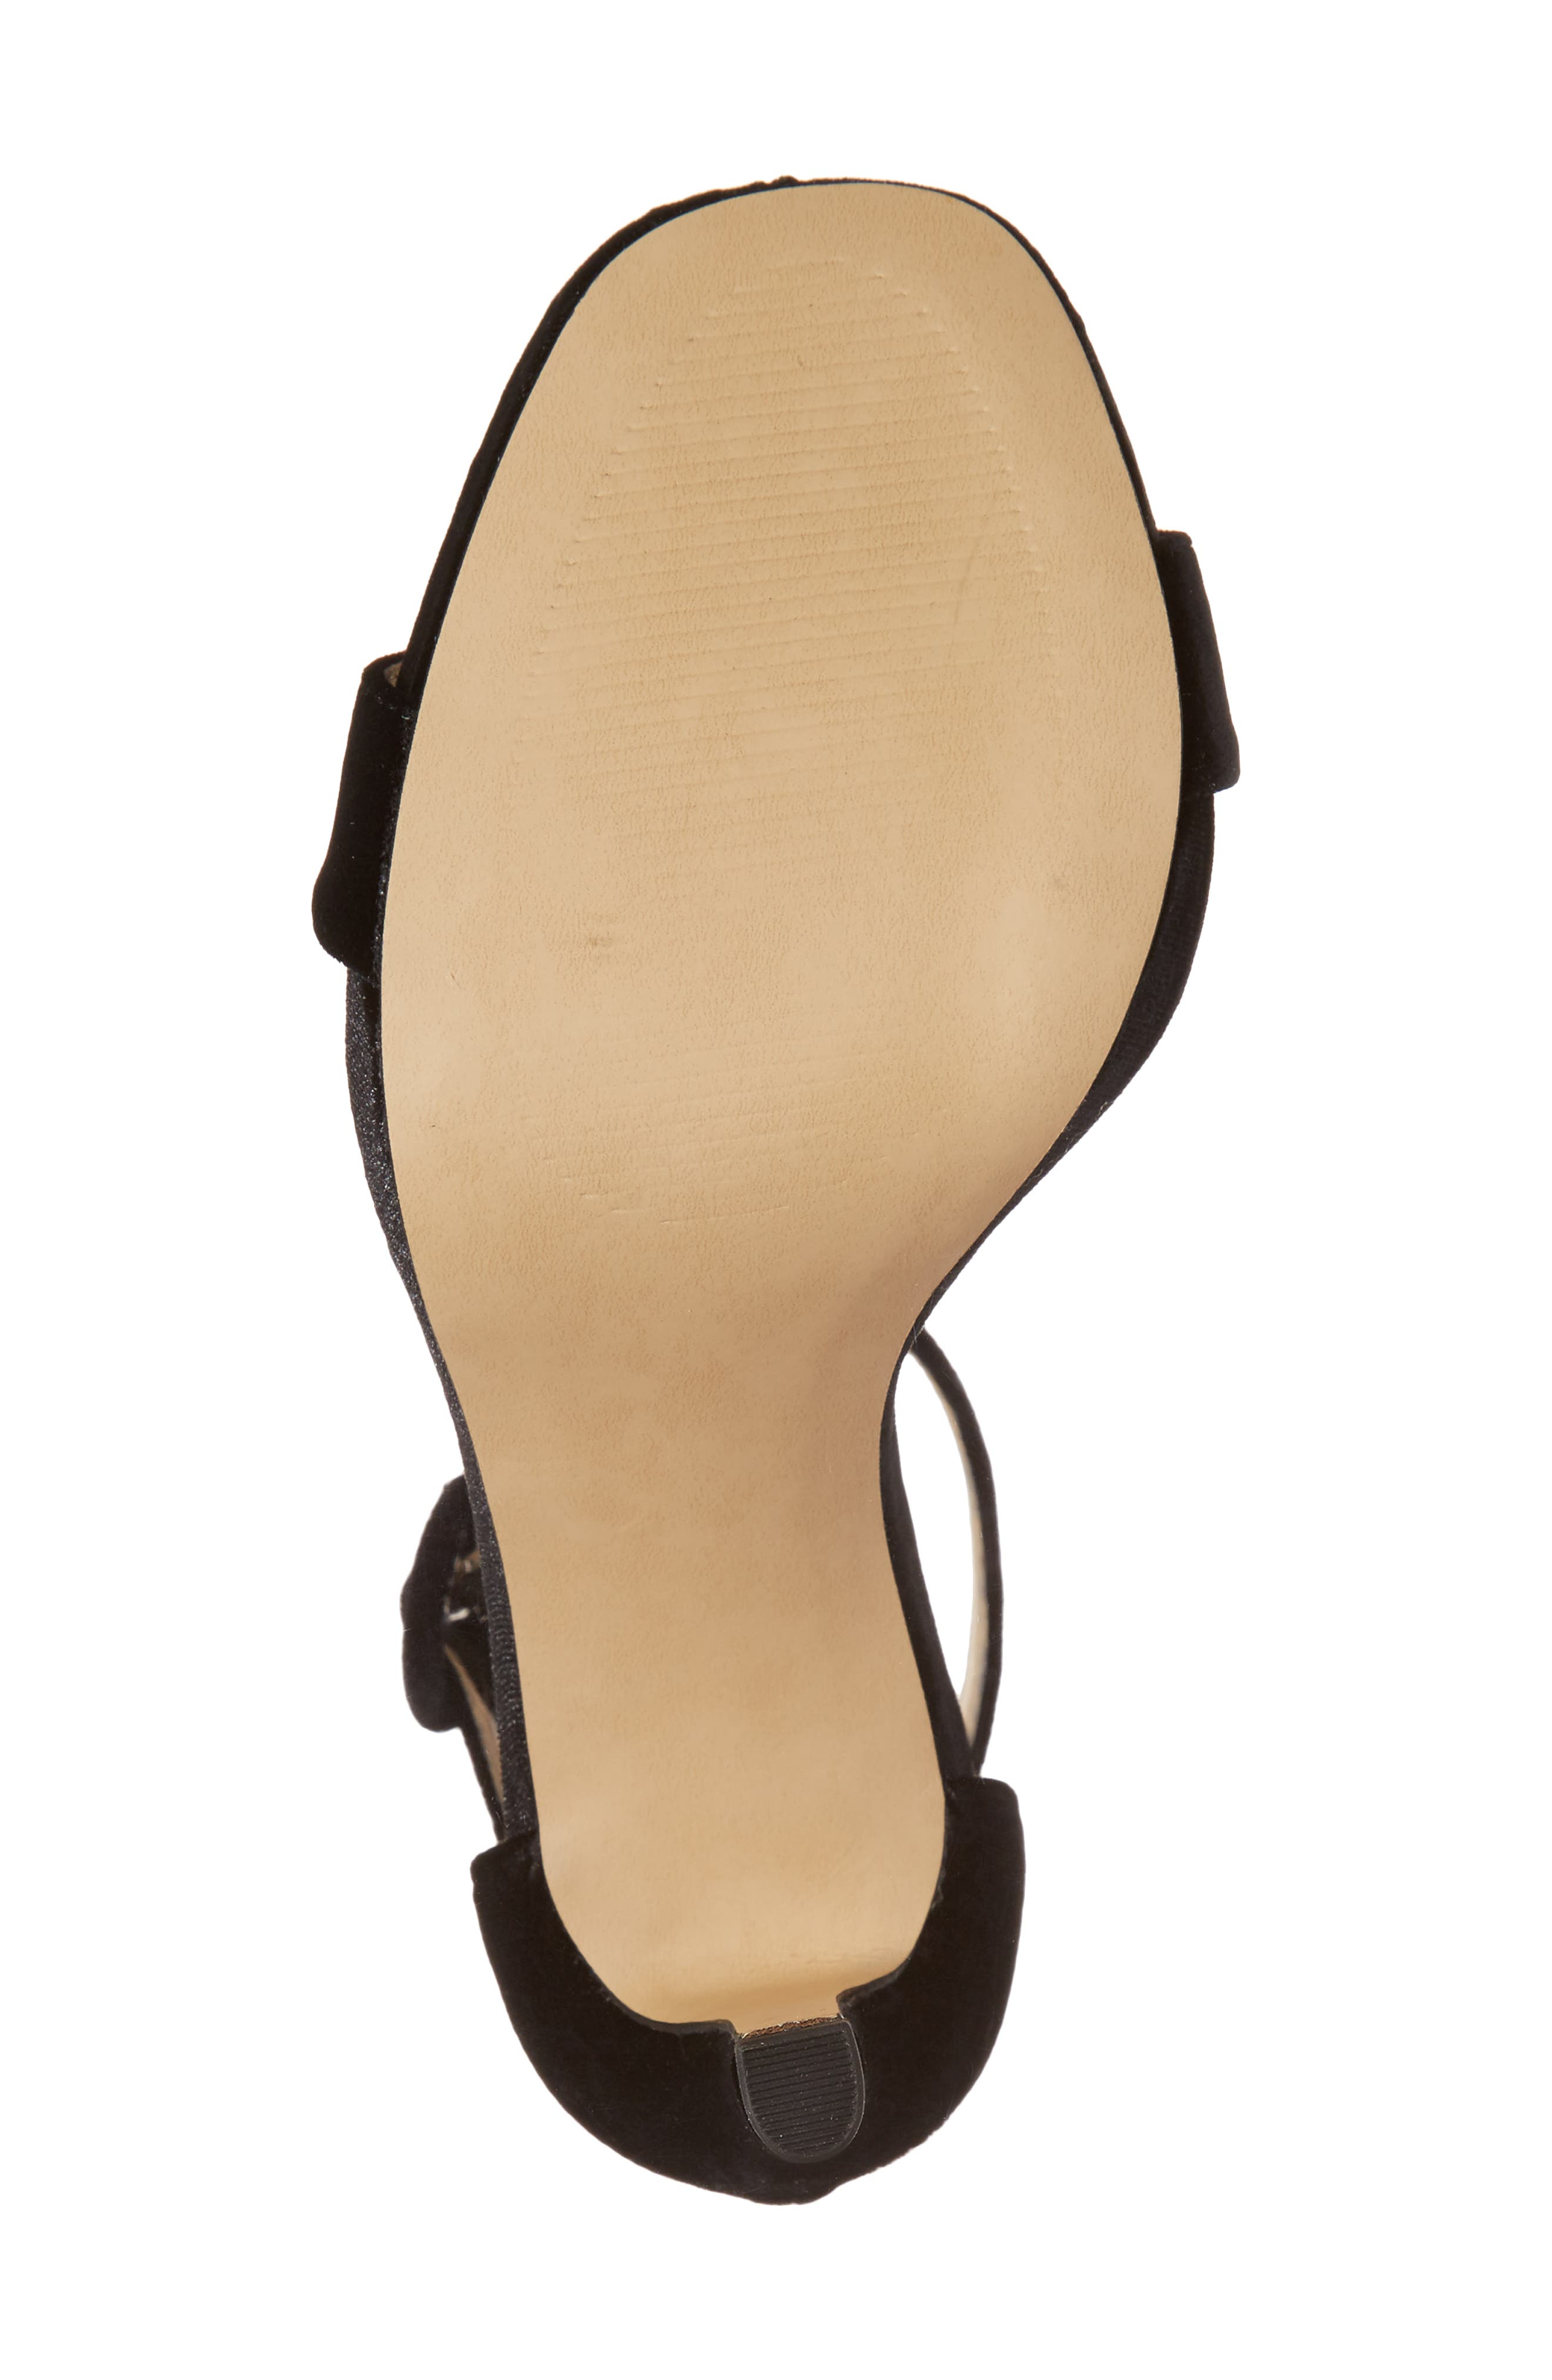 Emelia Ankle Strap Sandal,                             Alternate thumbnail 6, color,                             Black